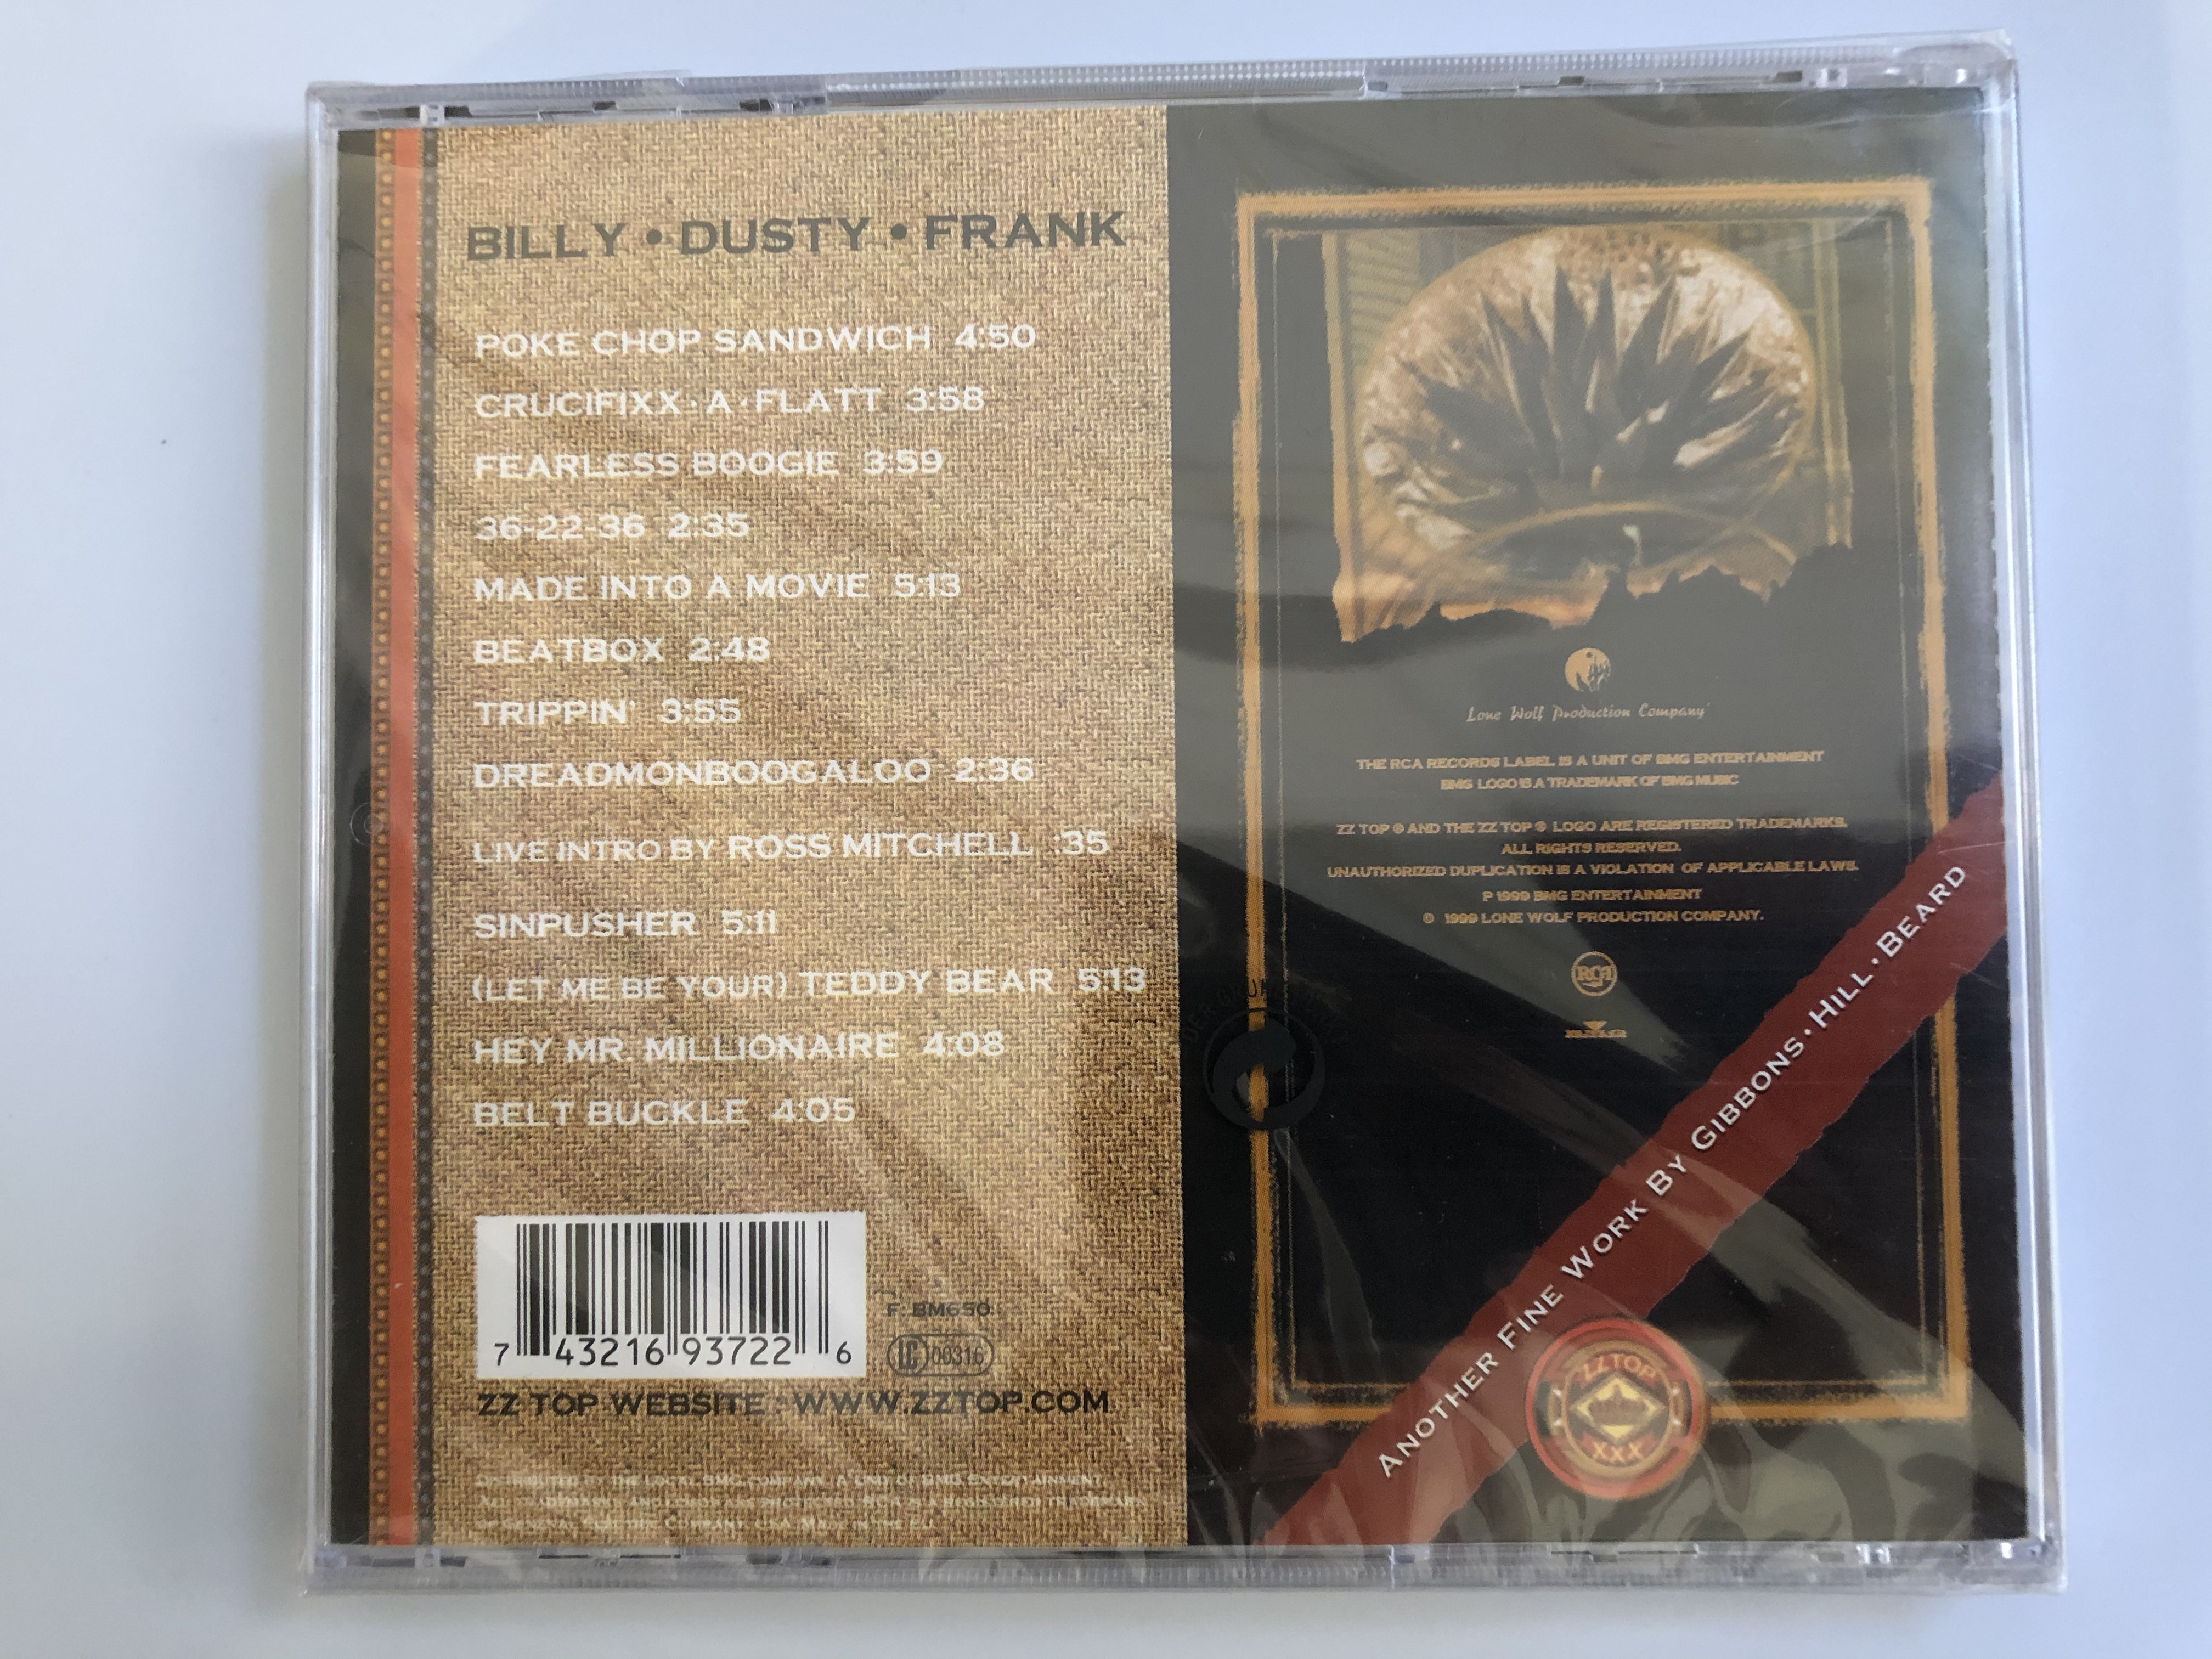 zz-top-xxx-rca-audio-cd-1999-74321-69372-2-2-.jpg